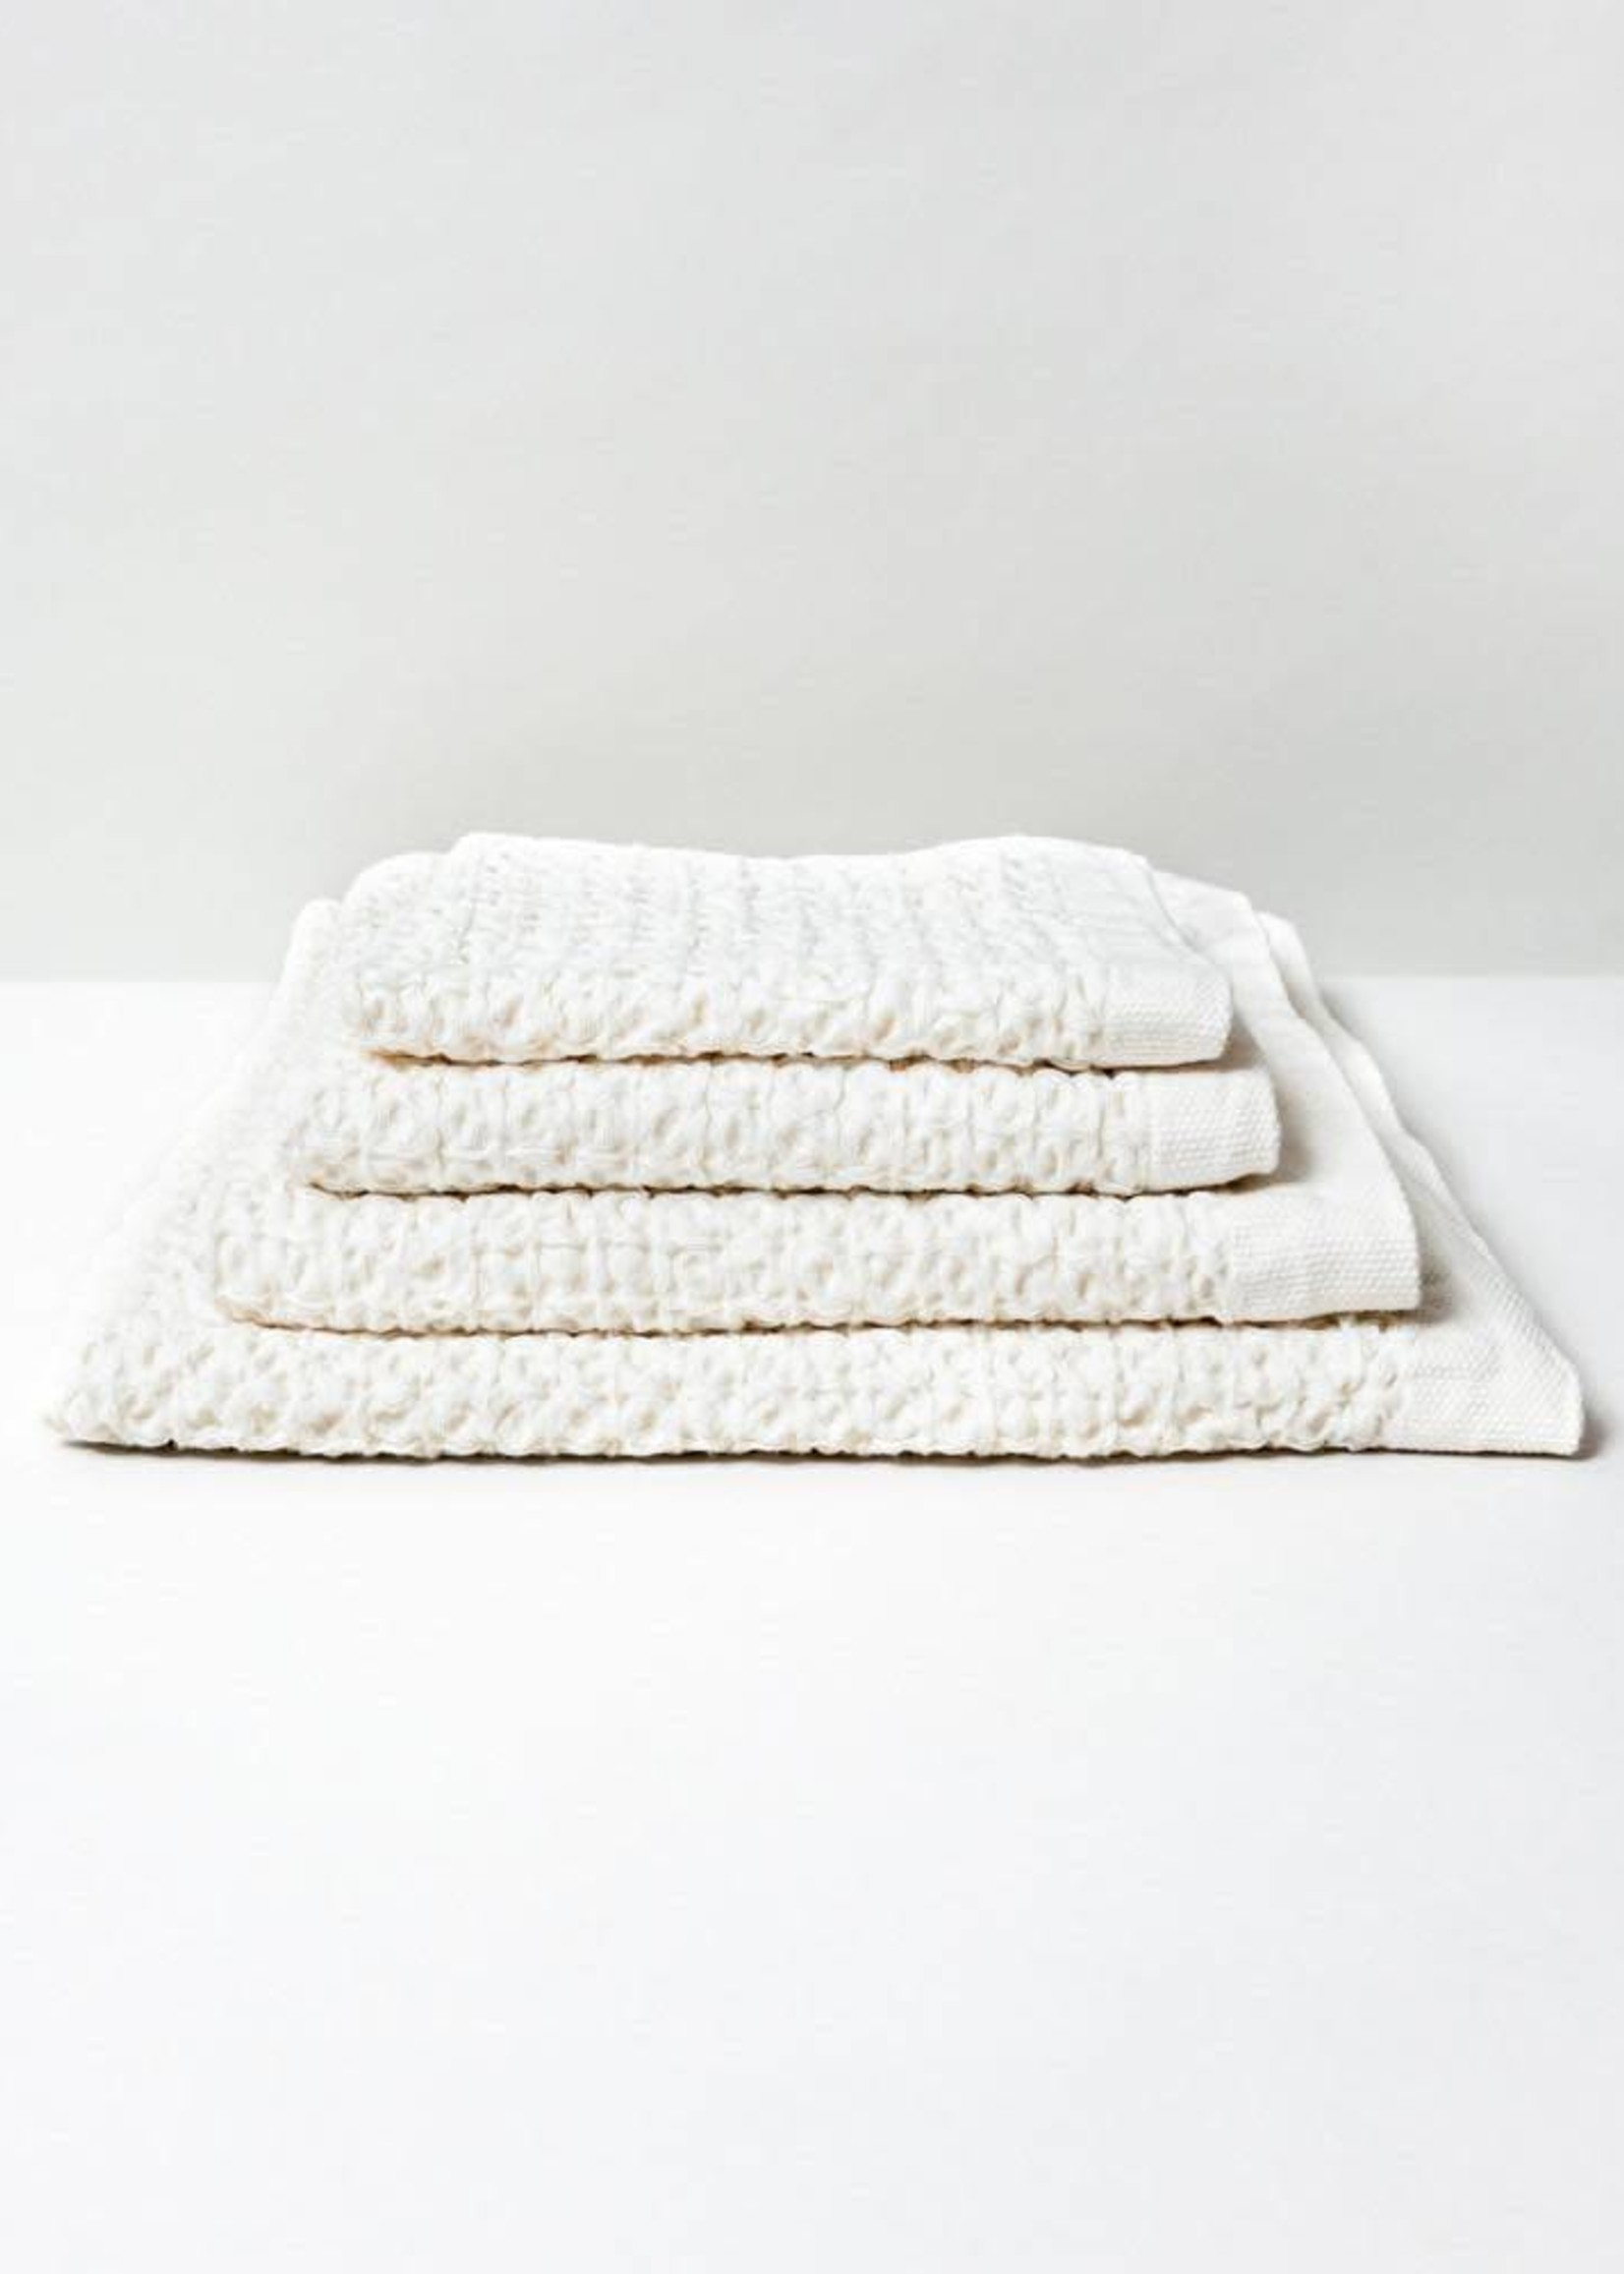 Morihata Lattice Linen Bath Towel: Ivory